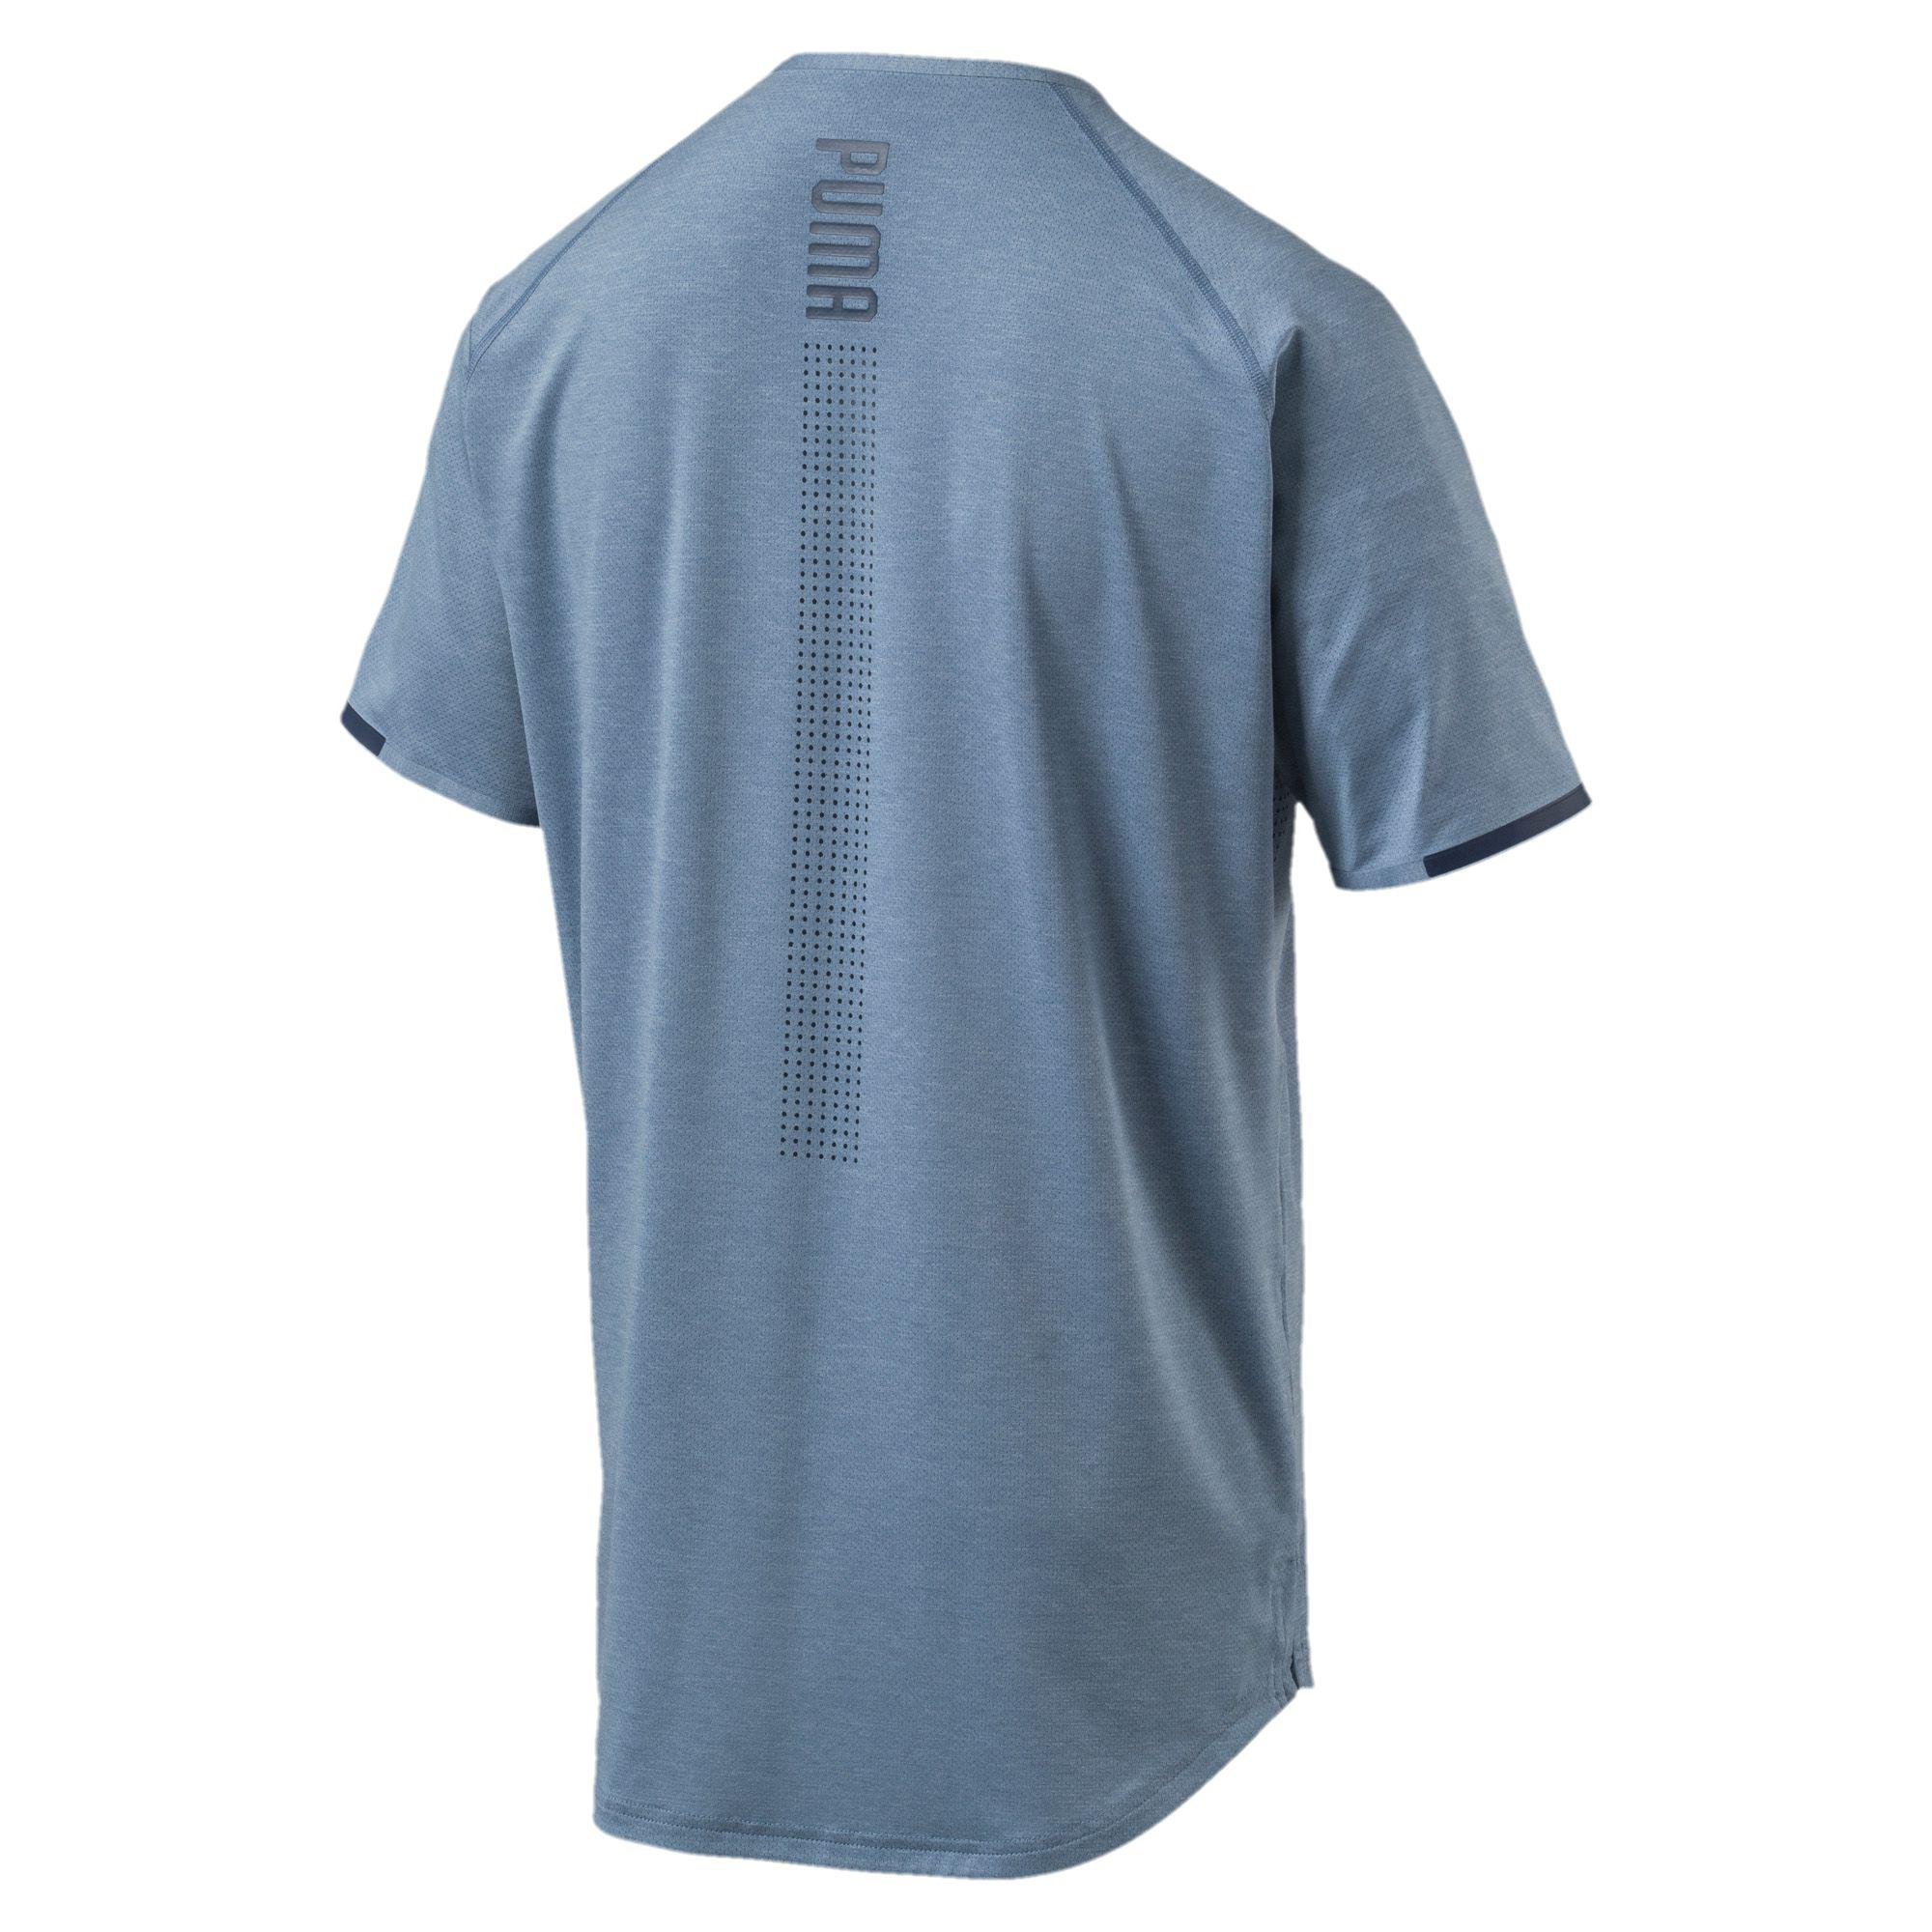 2f500aa50b8 Lyst - Puma Energy Laser Men's Short Sleeve Training Top in Blue for Men